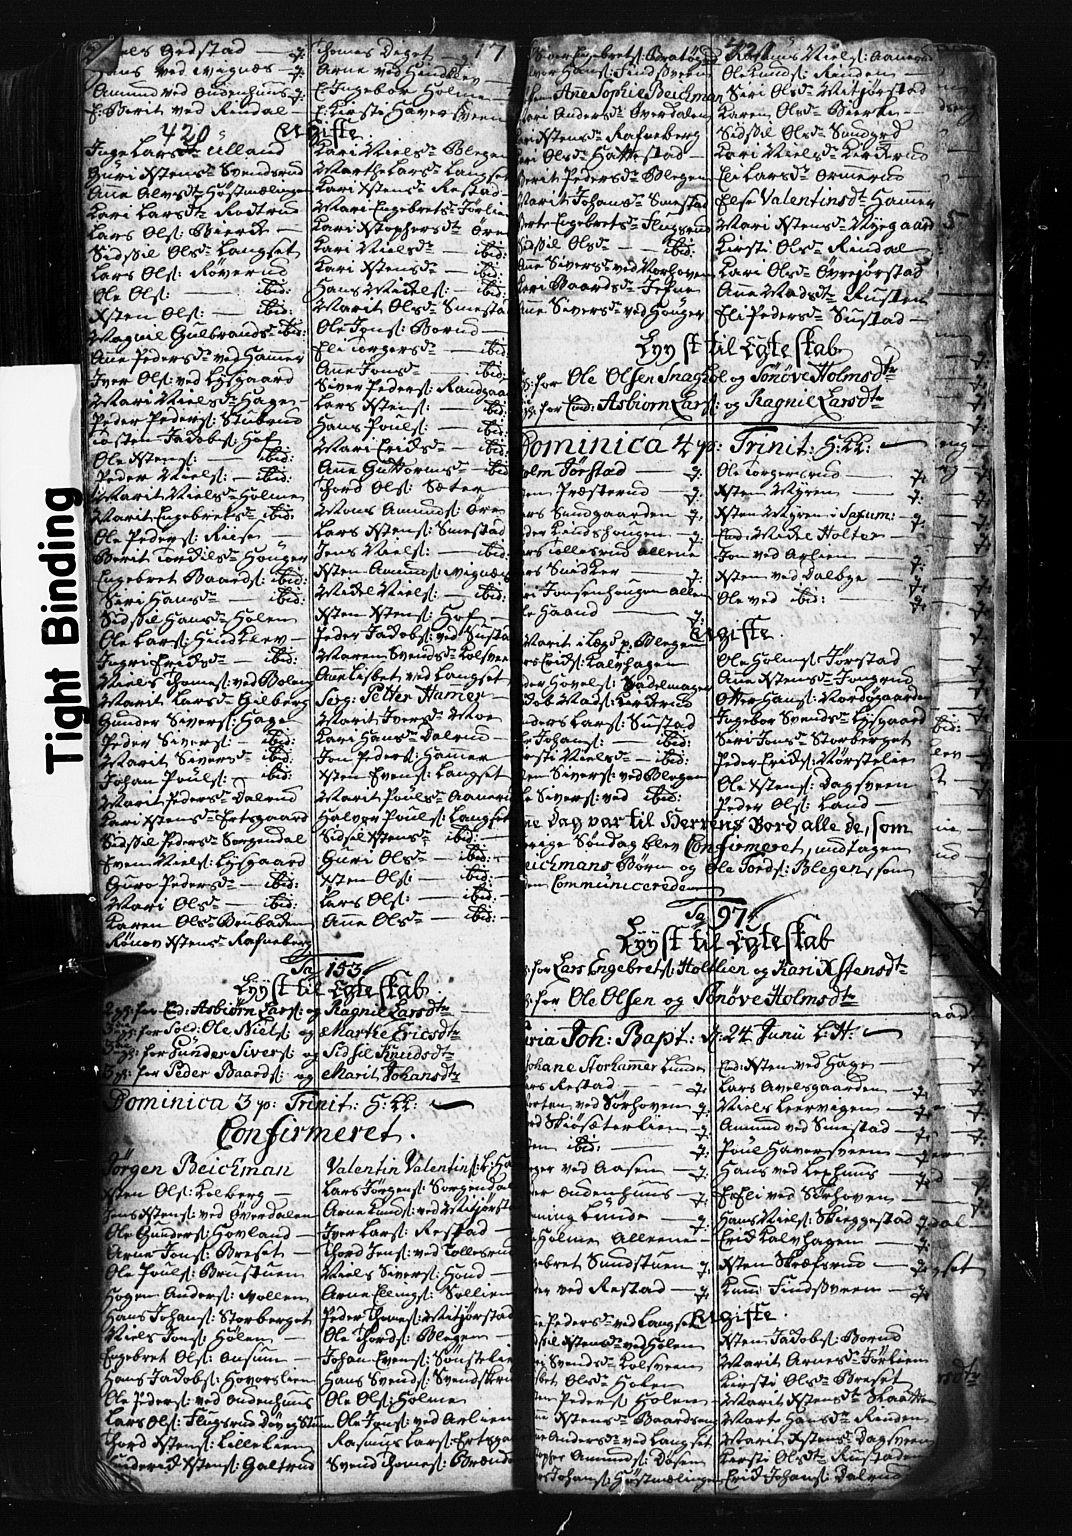 SAH, Fåberg prestekontor, Klokkerbok nr. 1, 1727-1767, s. 420-421